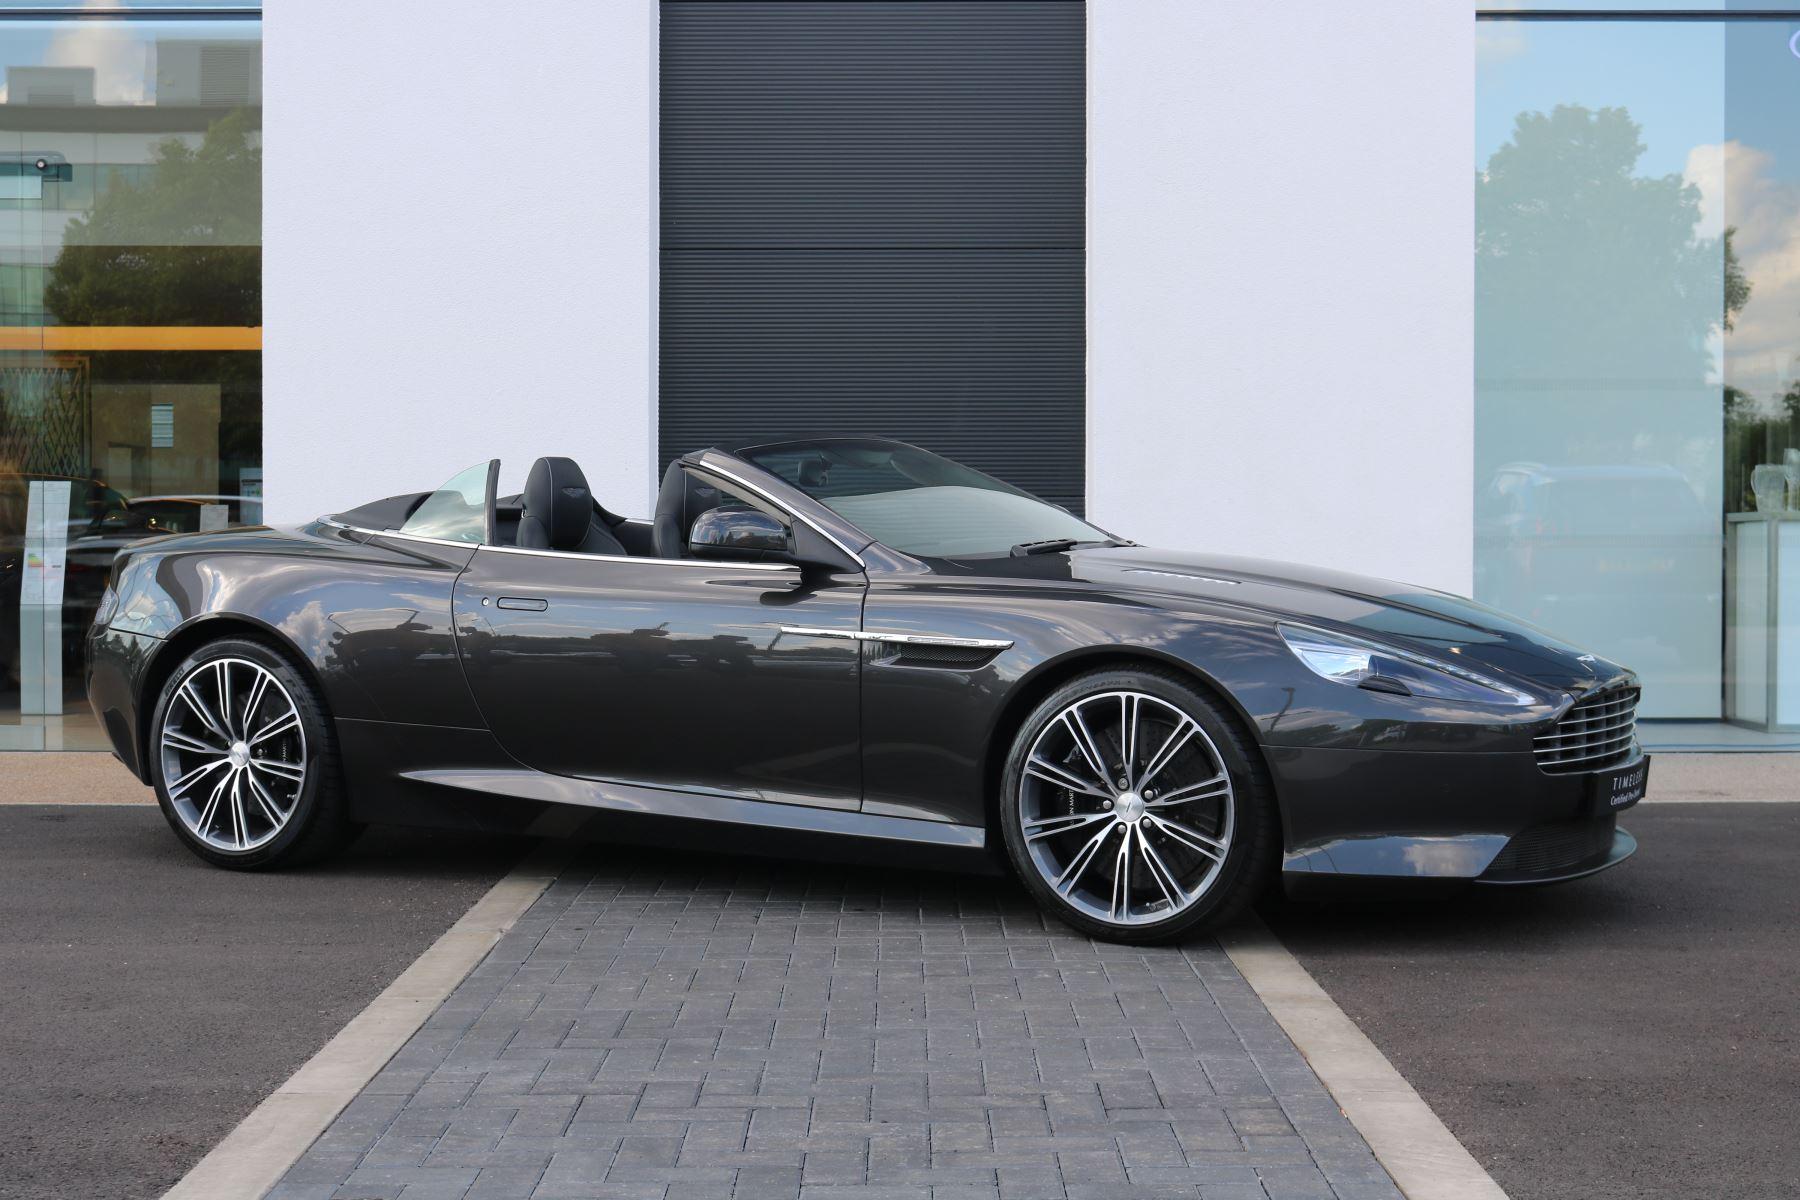 Aston Martin Virage V12 2dr Volante Touchtronic image 8